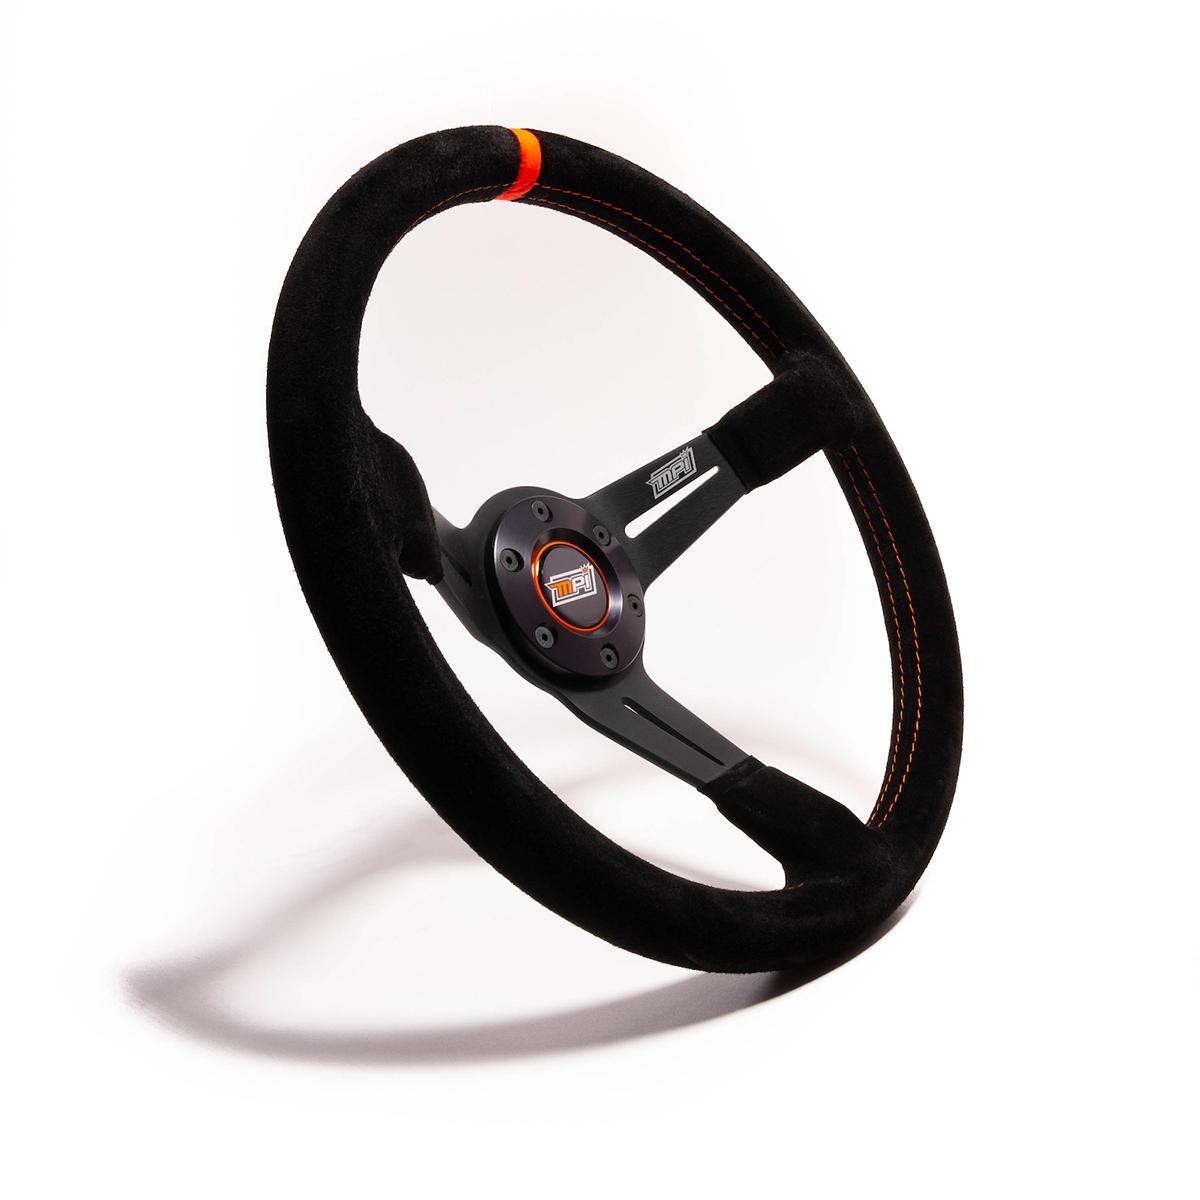 MPI USA MPI-DO-14-C Steering Wheel, Drifting / Track Day / Dirt / Off Road, 13-3/4 in Diameter, 3 Spoke, 3-1/2 in Dish, Black Suede Grip, Orange Stripe, Aluminum, Black, Each